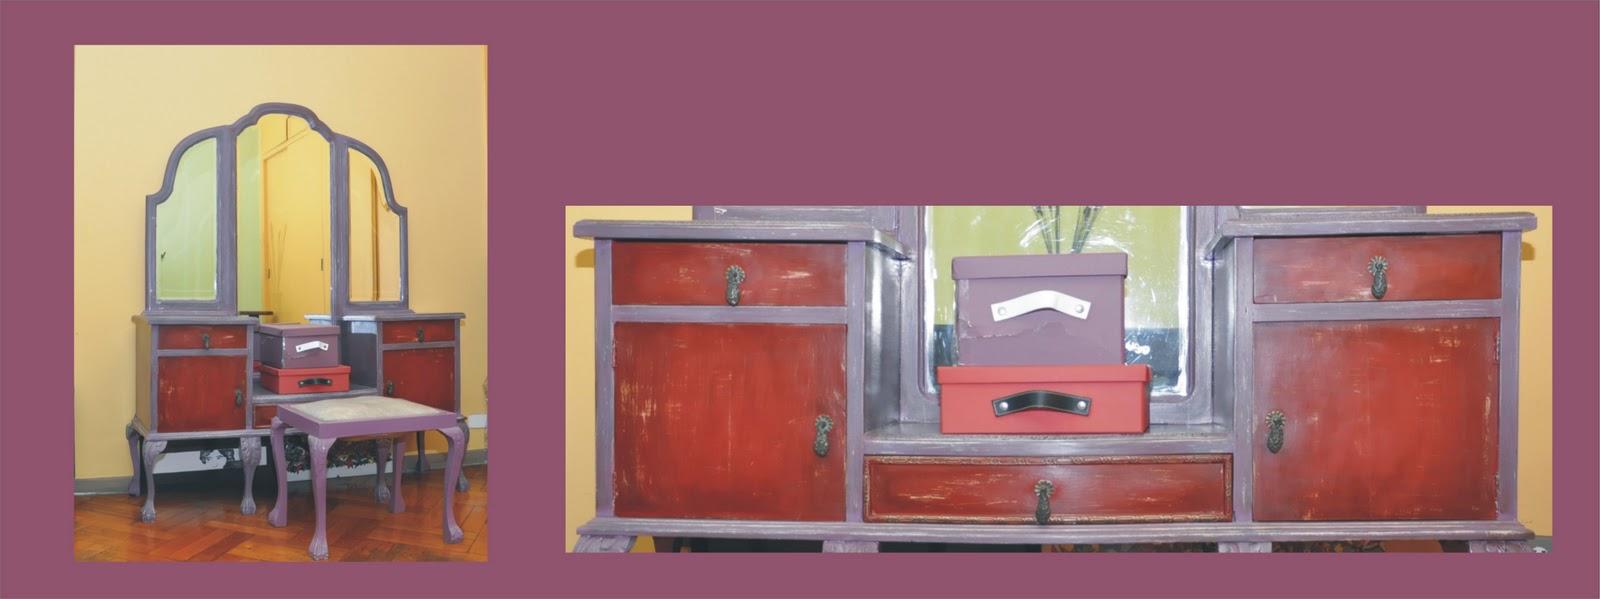 Quinta casa muebles pintados Muebles antiguos pintados a mano